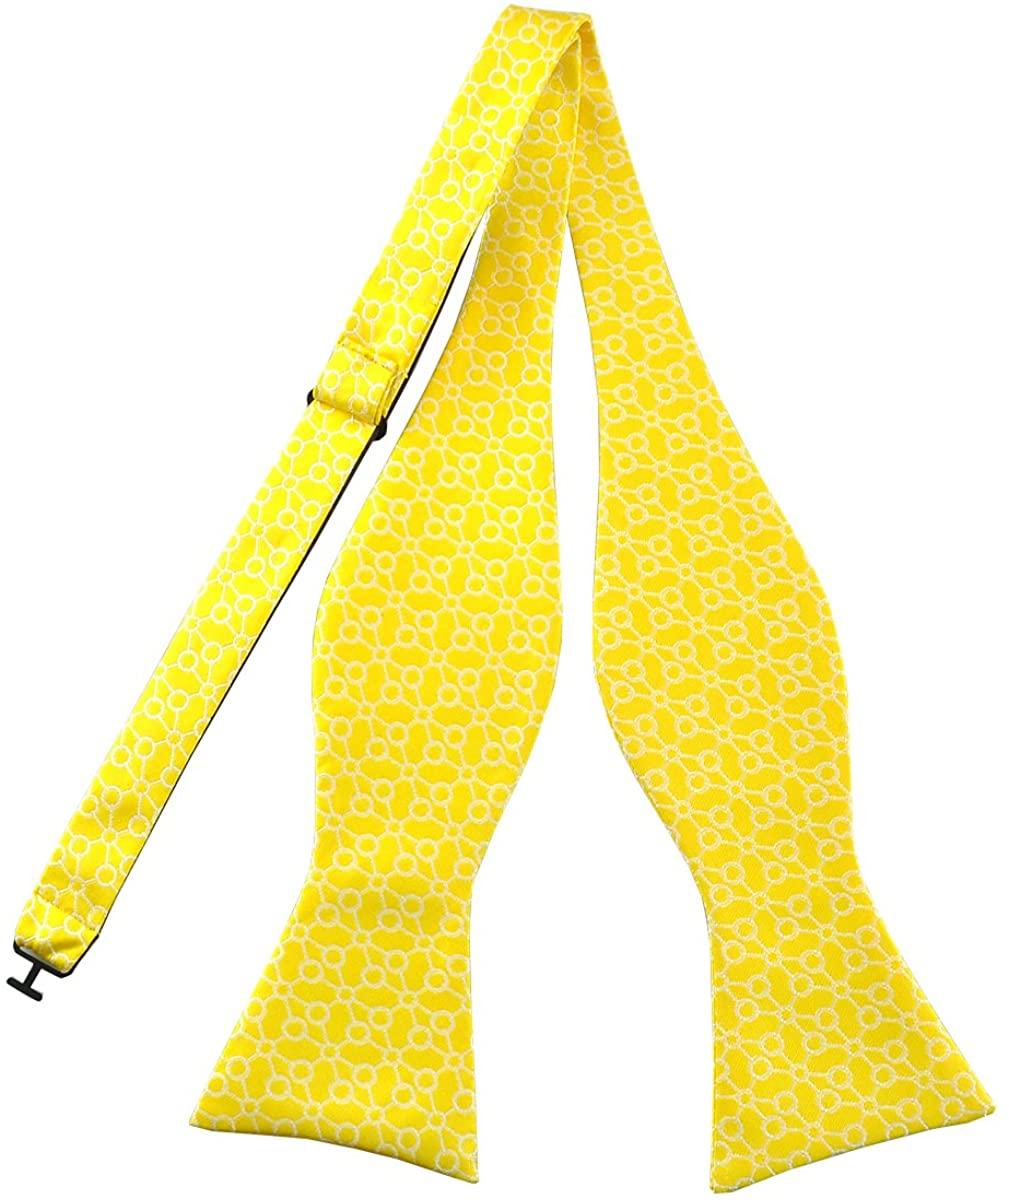 PenSee Mens Bow Ties Self Tie Novelty Geometric Figure Jacquard Woven Bowties, Various Styles